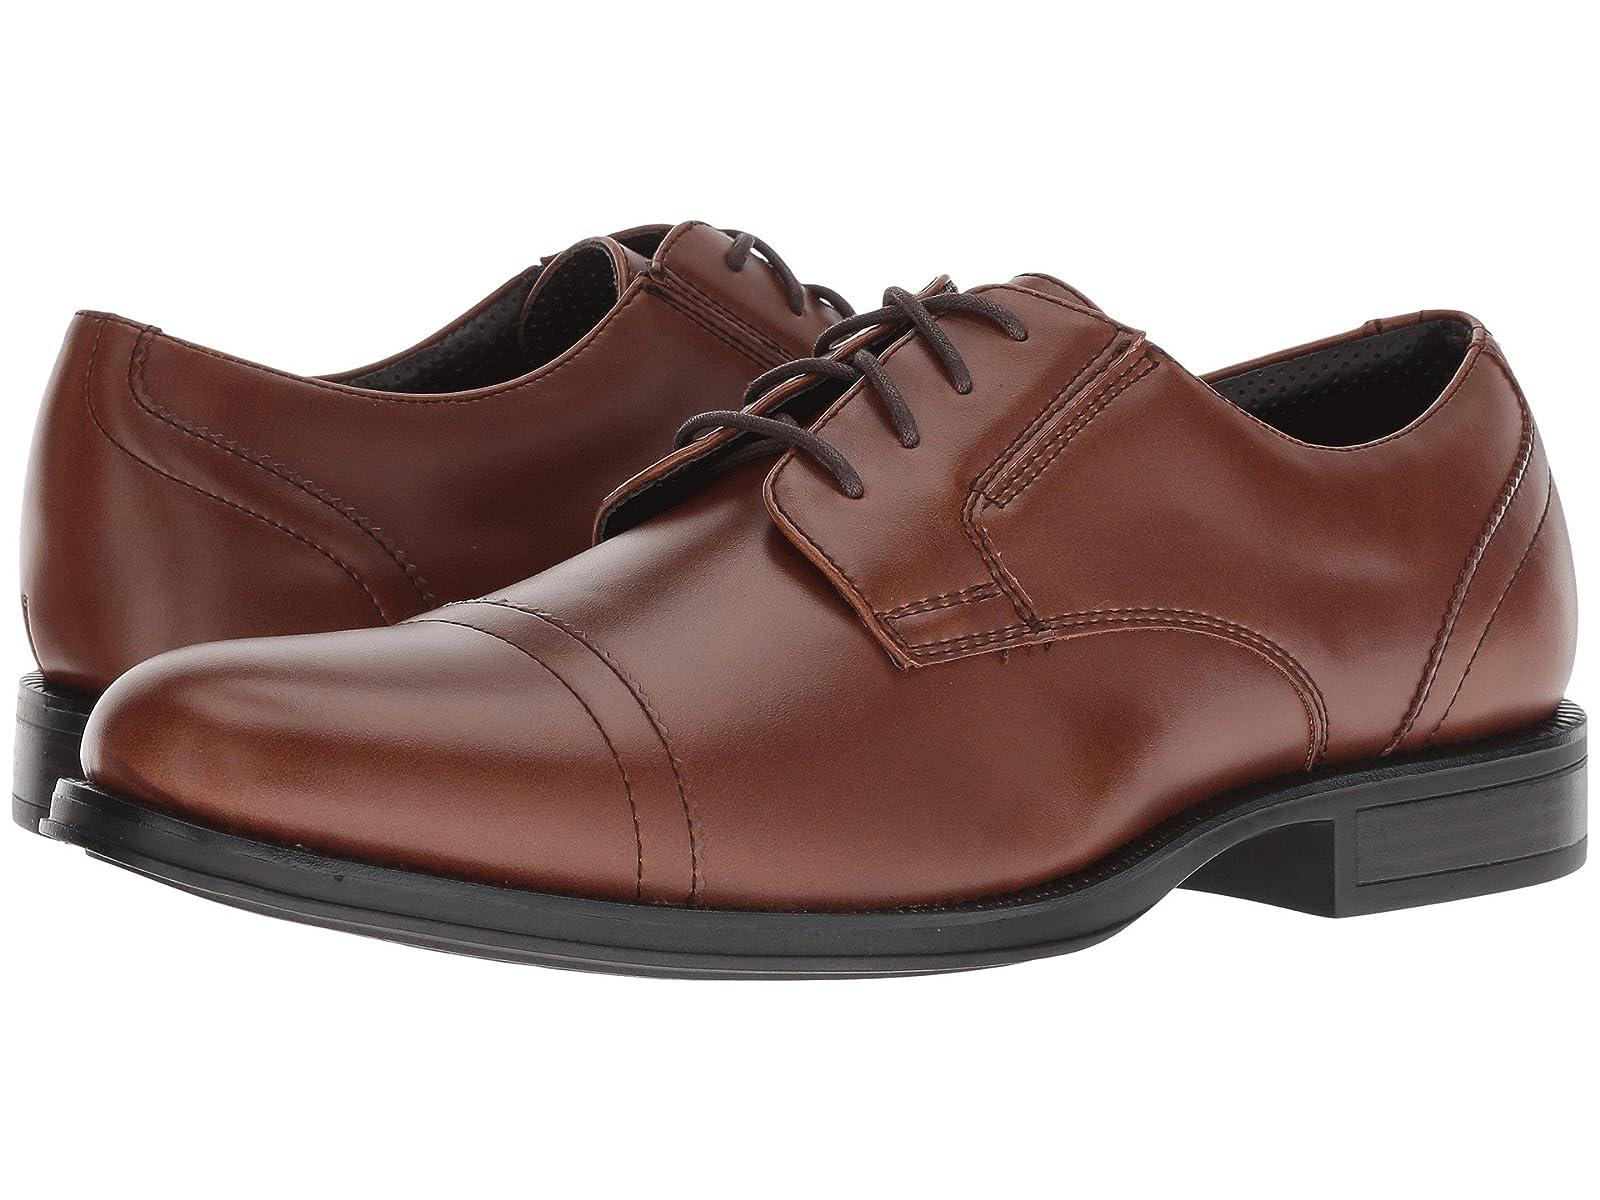 Dockers GarfieldCheap and distinctive eye-catching shoes